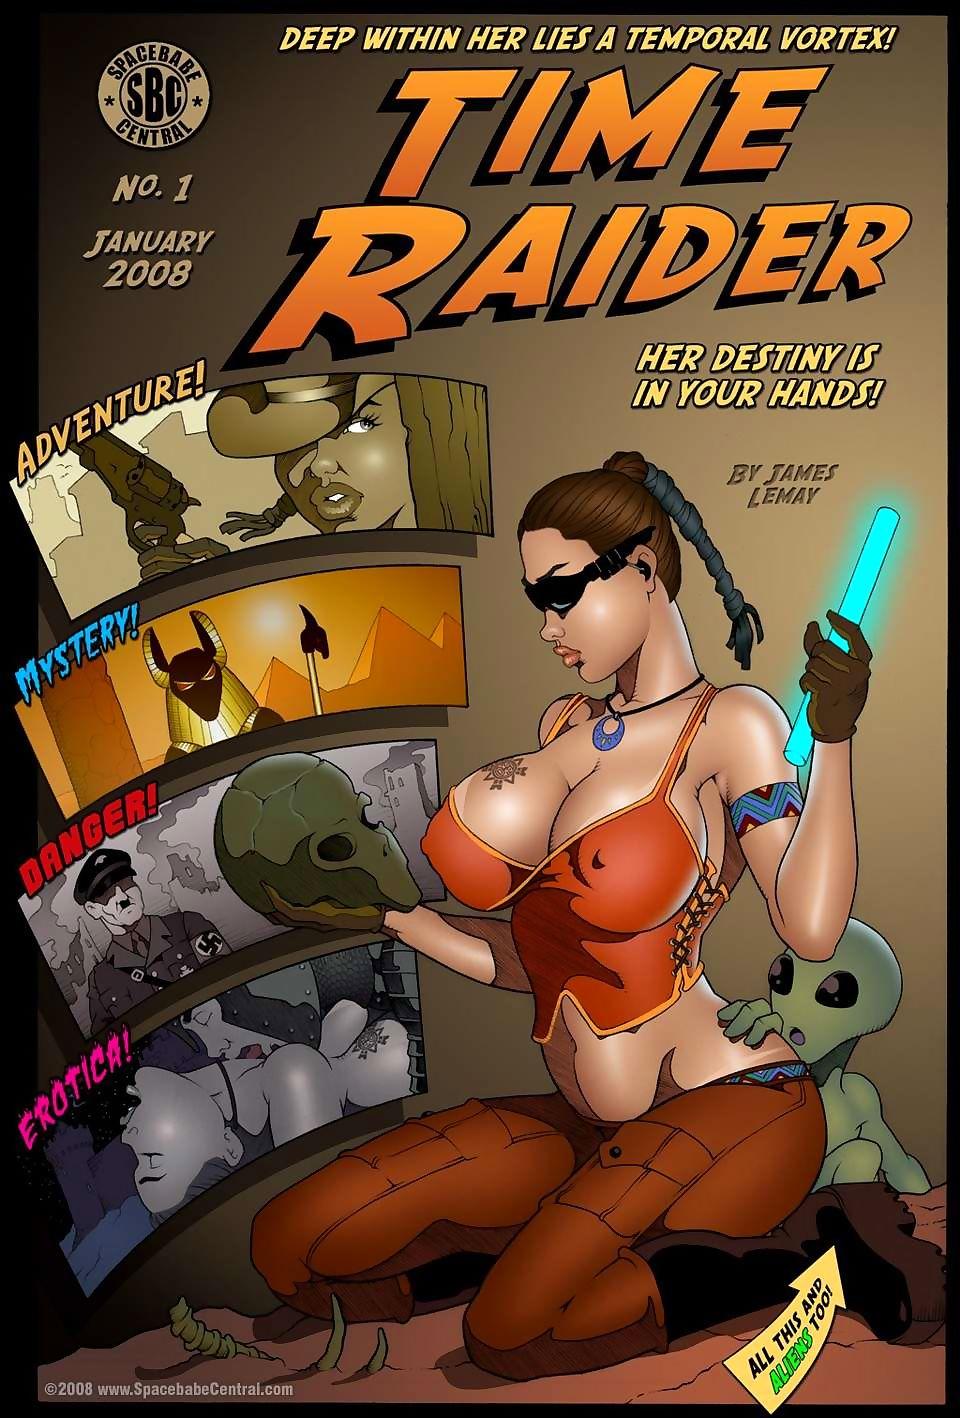 Lara Craft- Be transferred to Maturity Raider,James Lemay